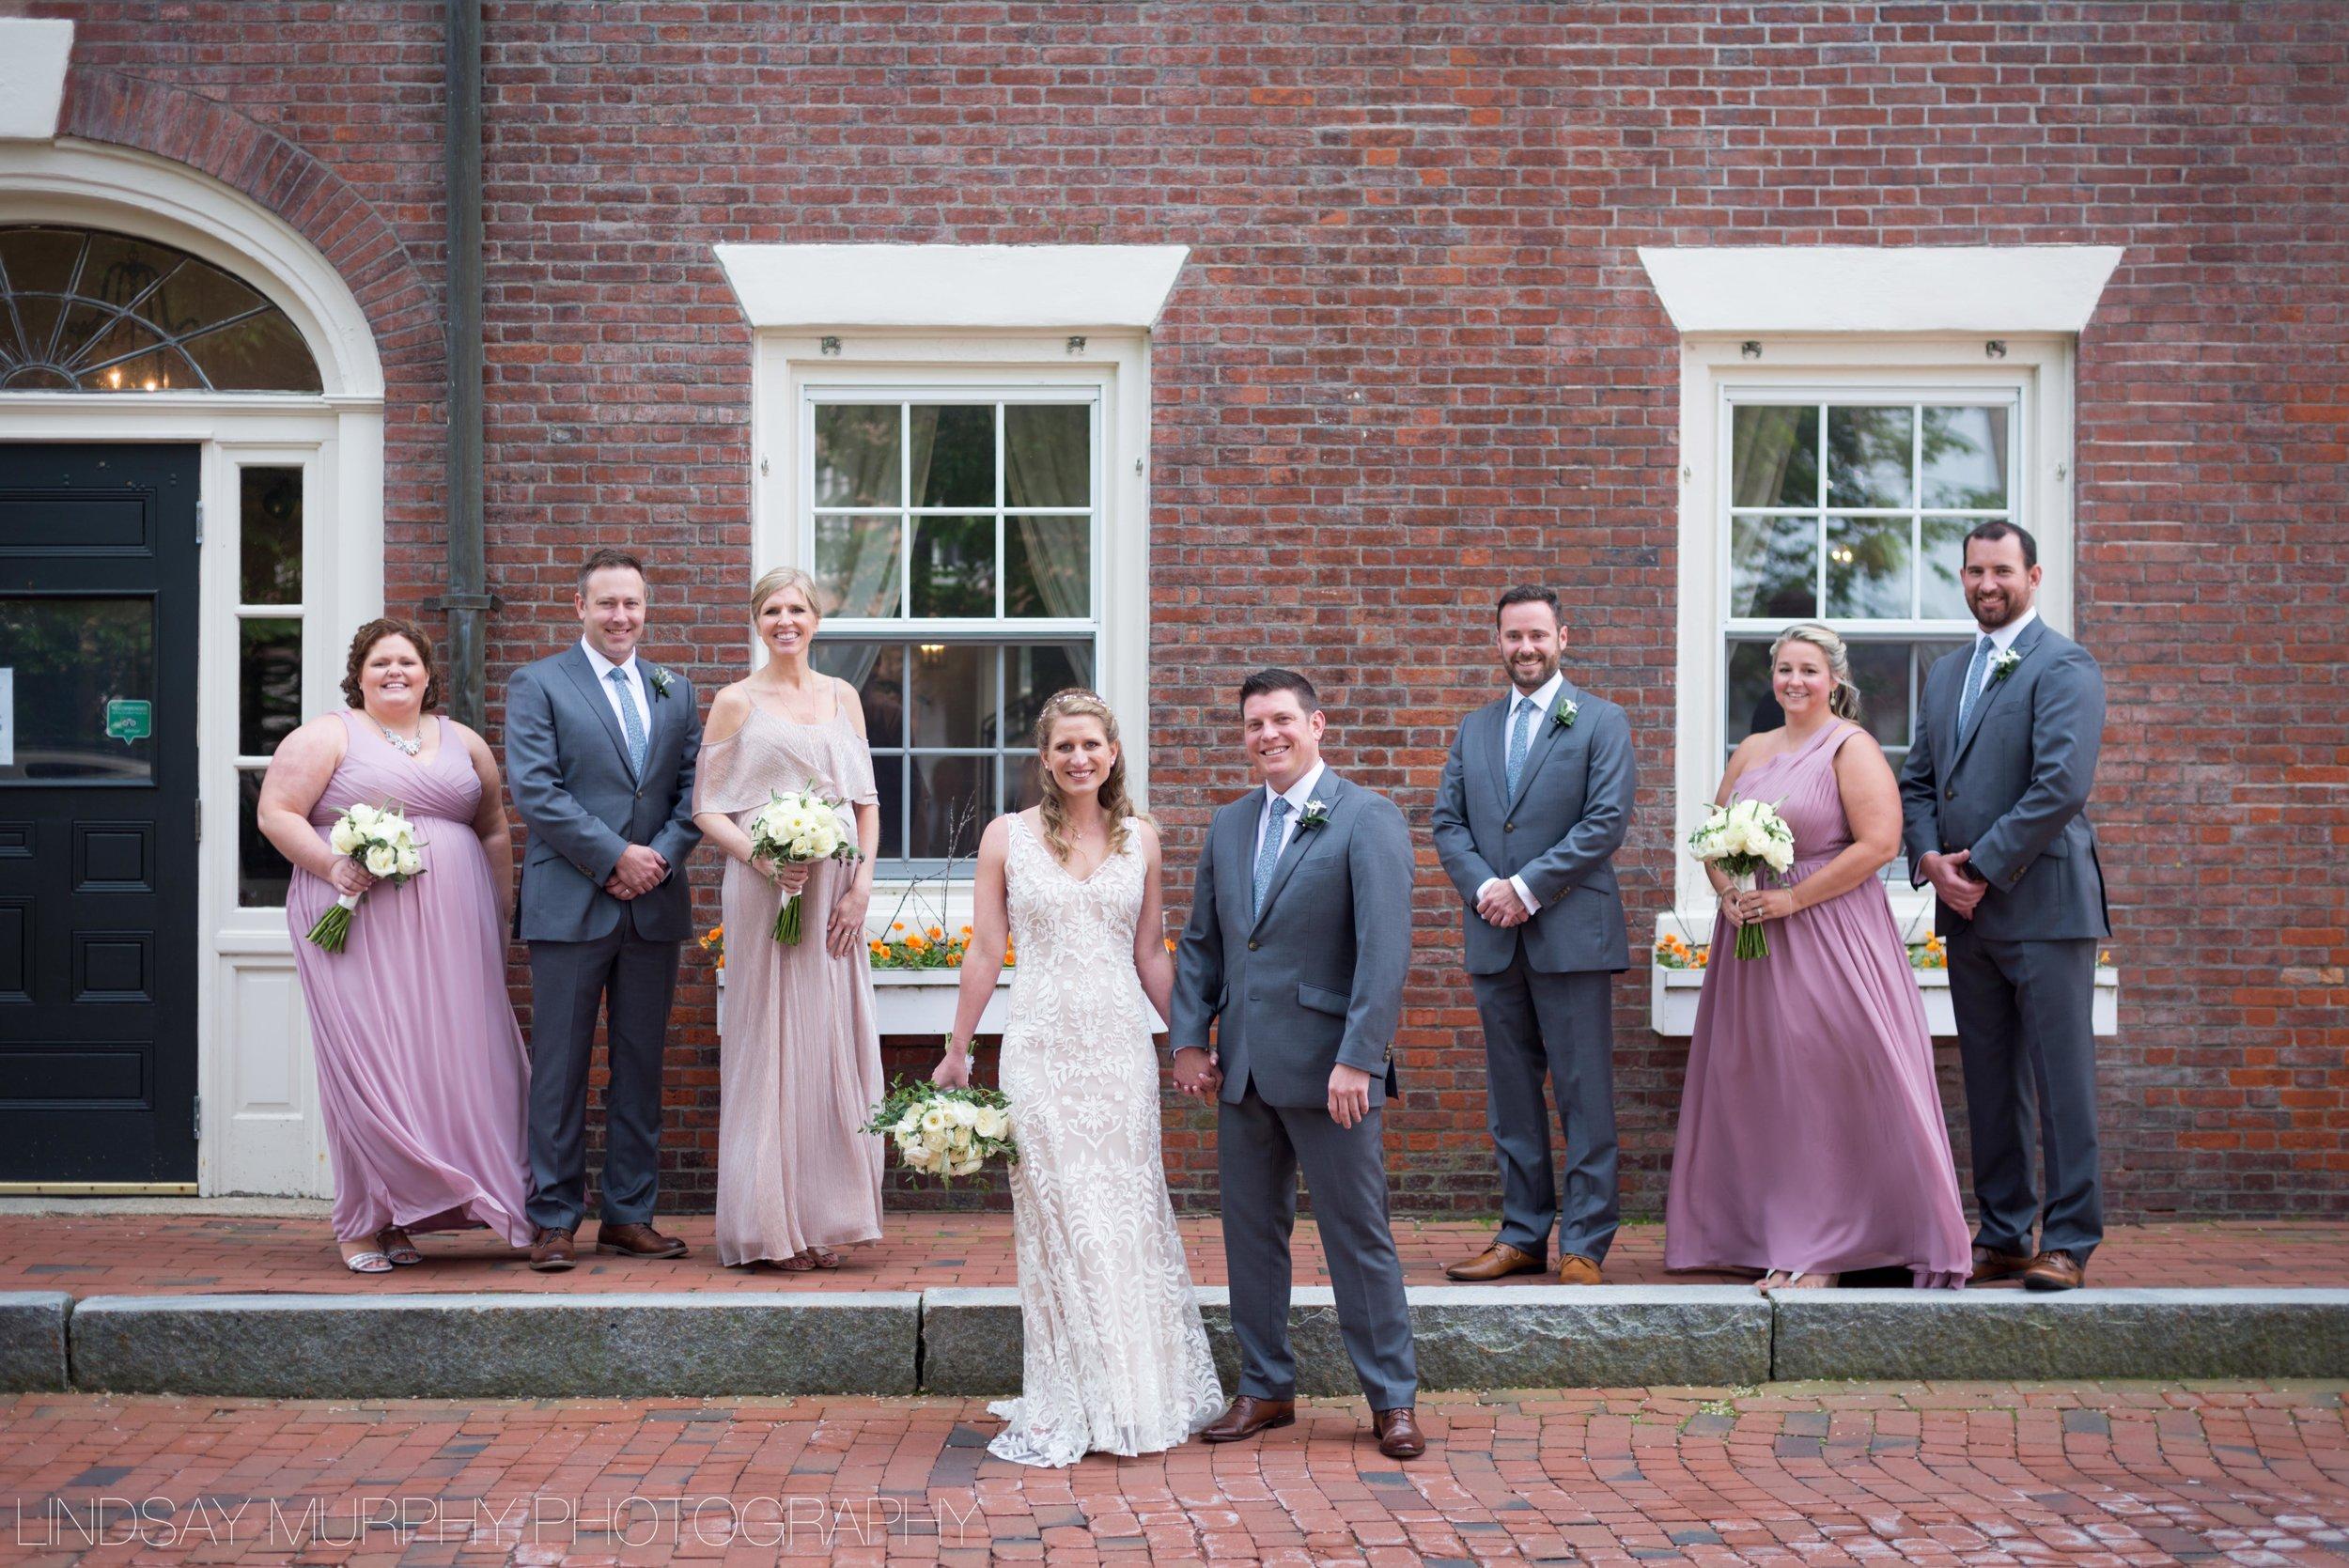 Ipswich_Wedding-47.jpg